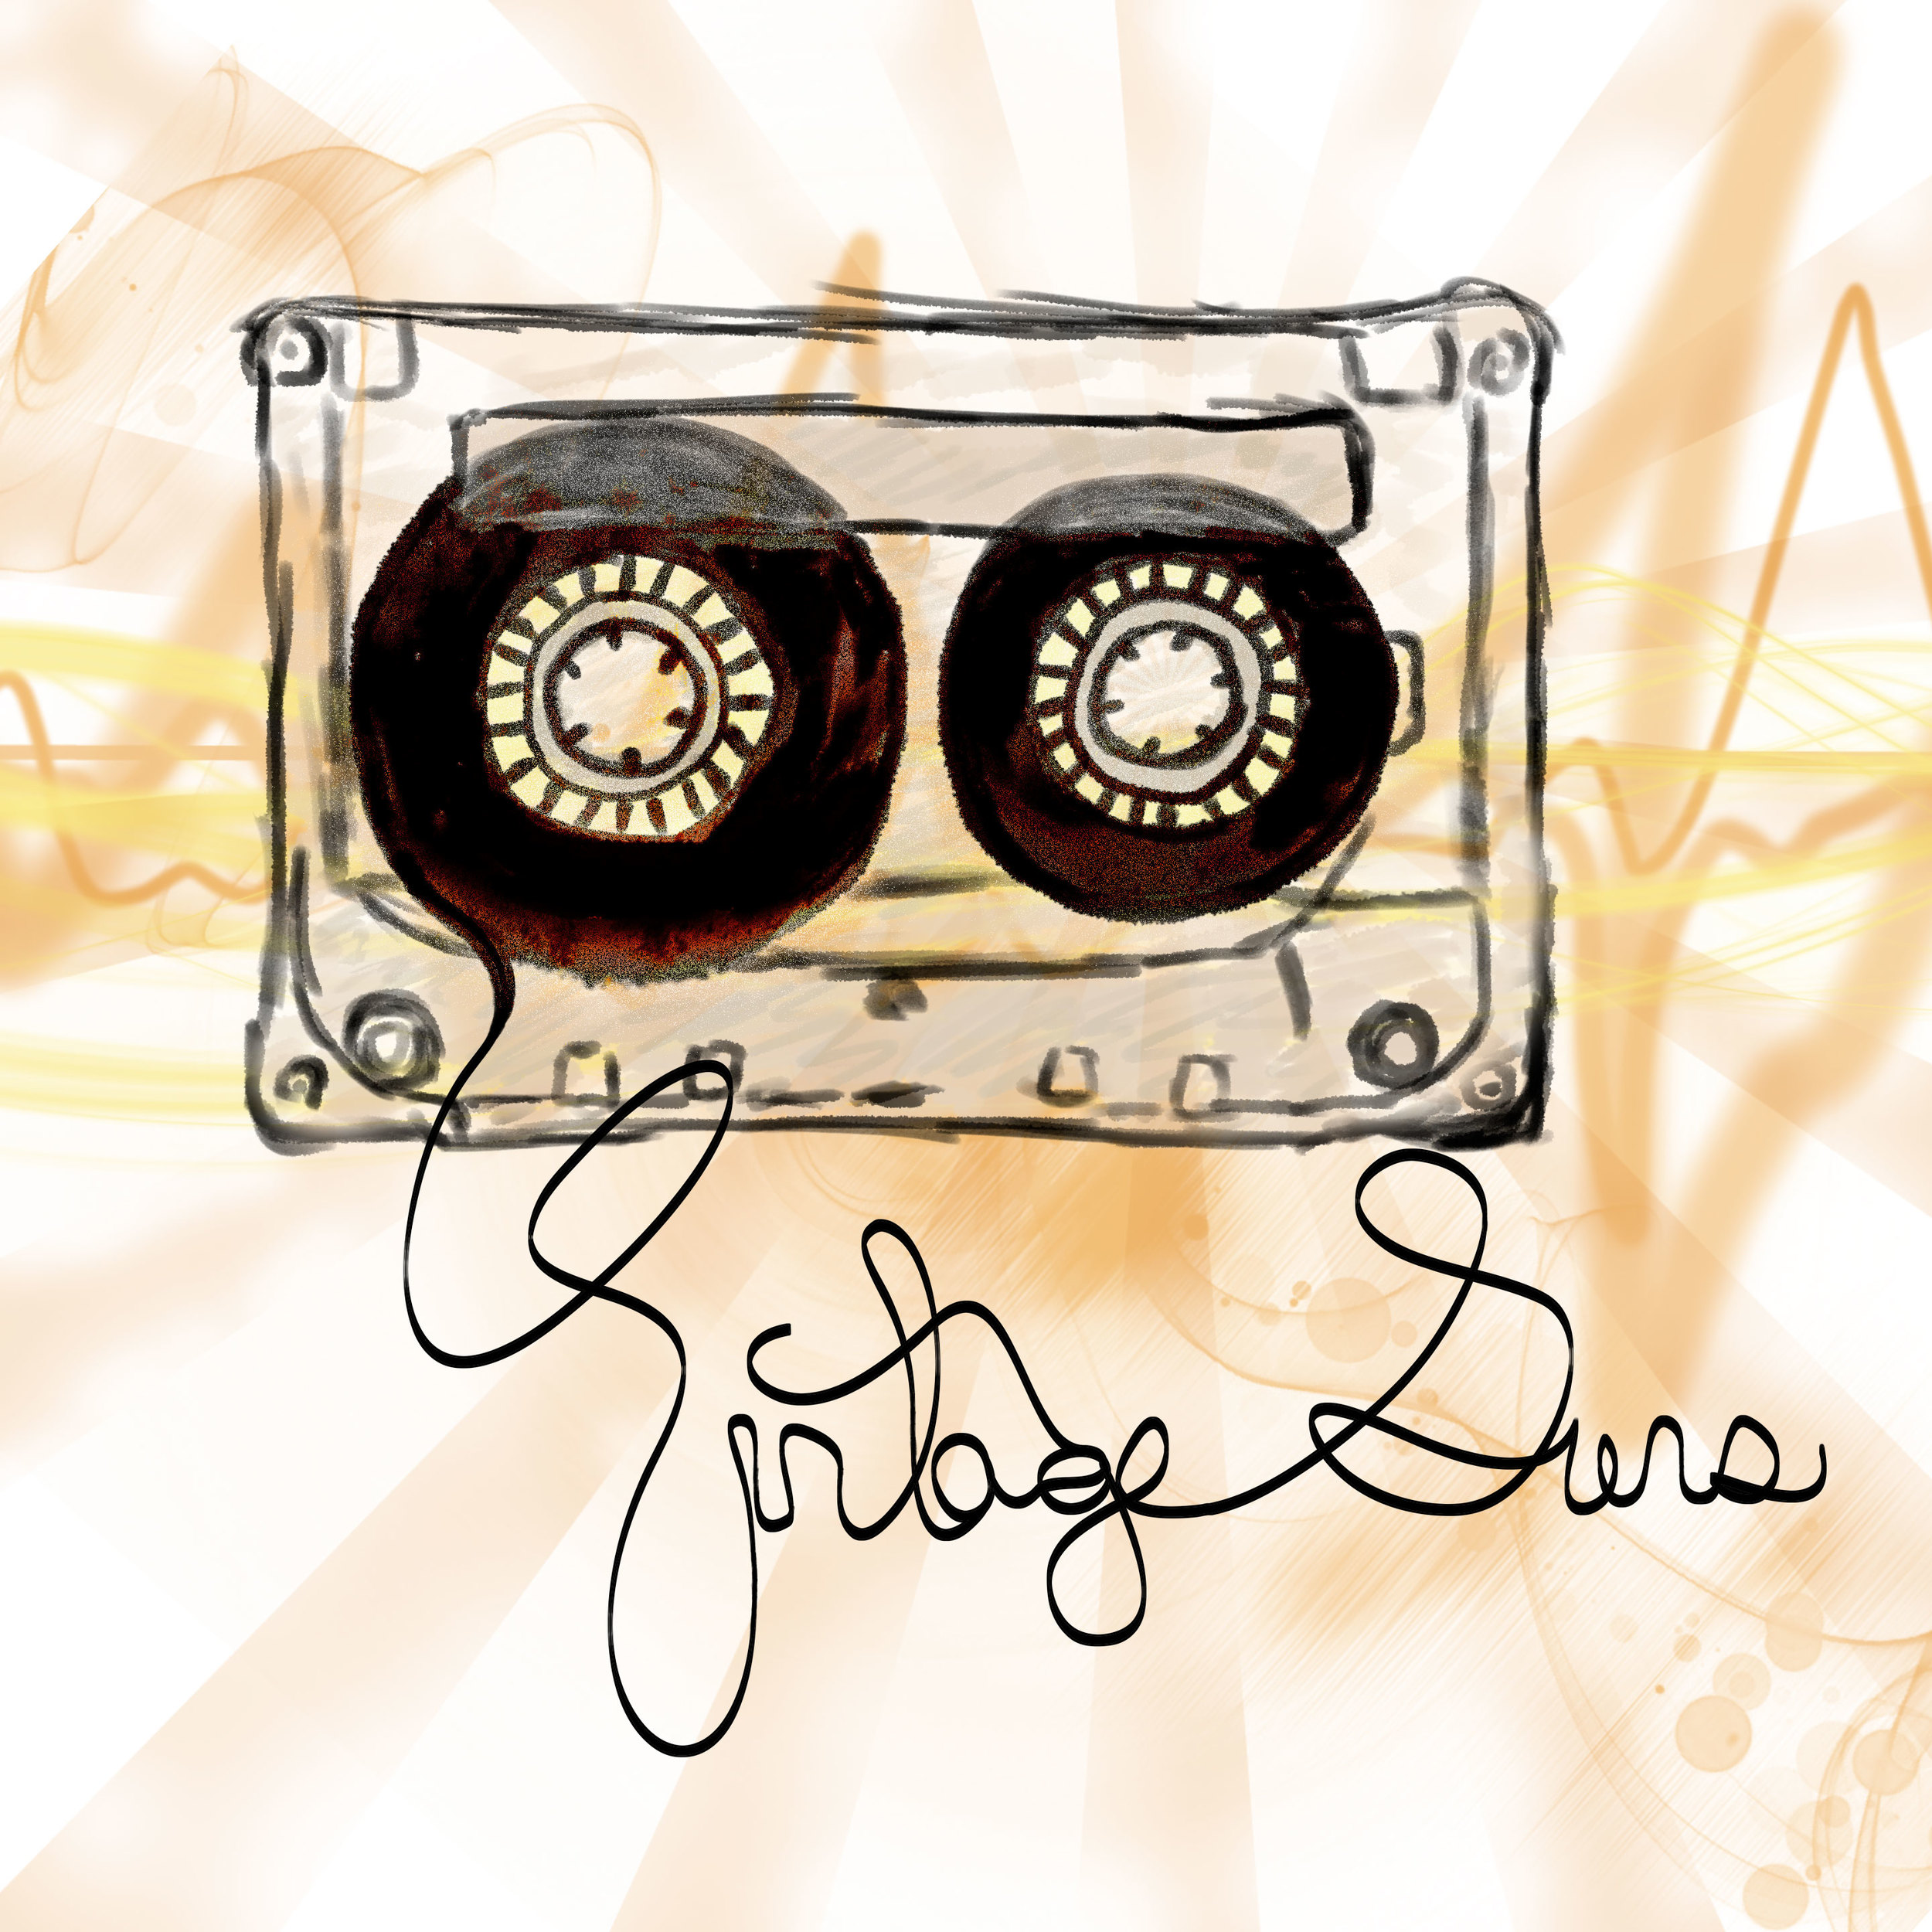 Vintage-Suns-Tape-Cover.jpg